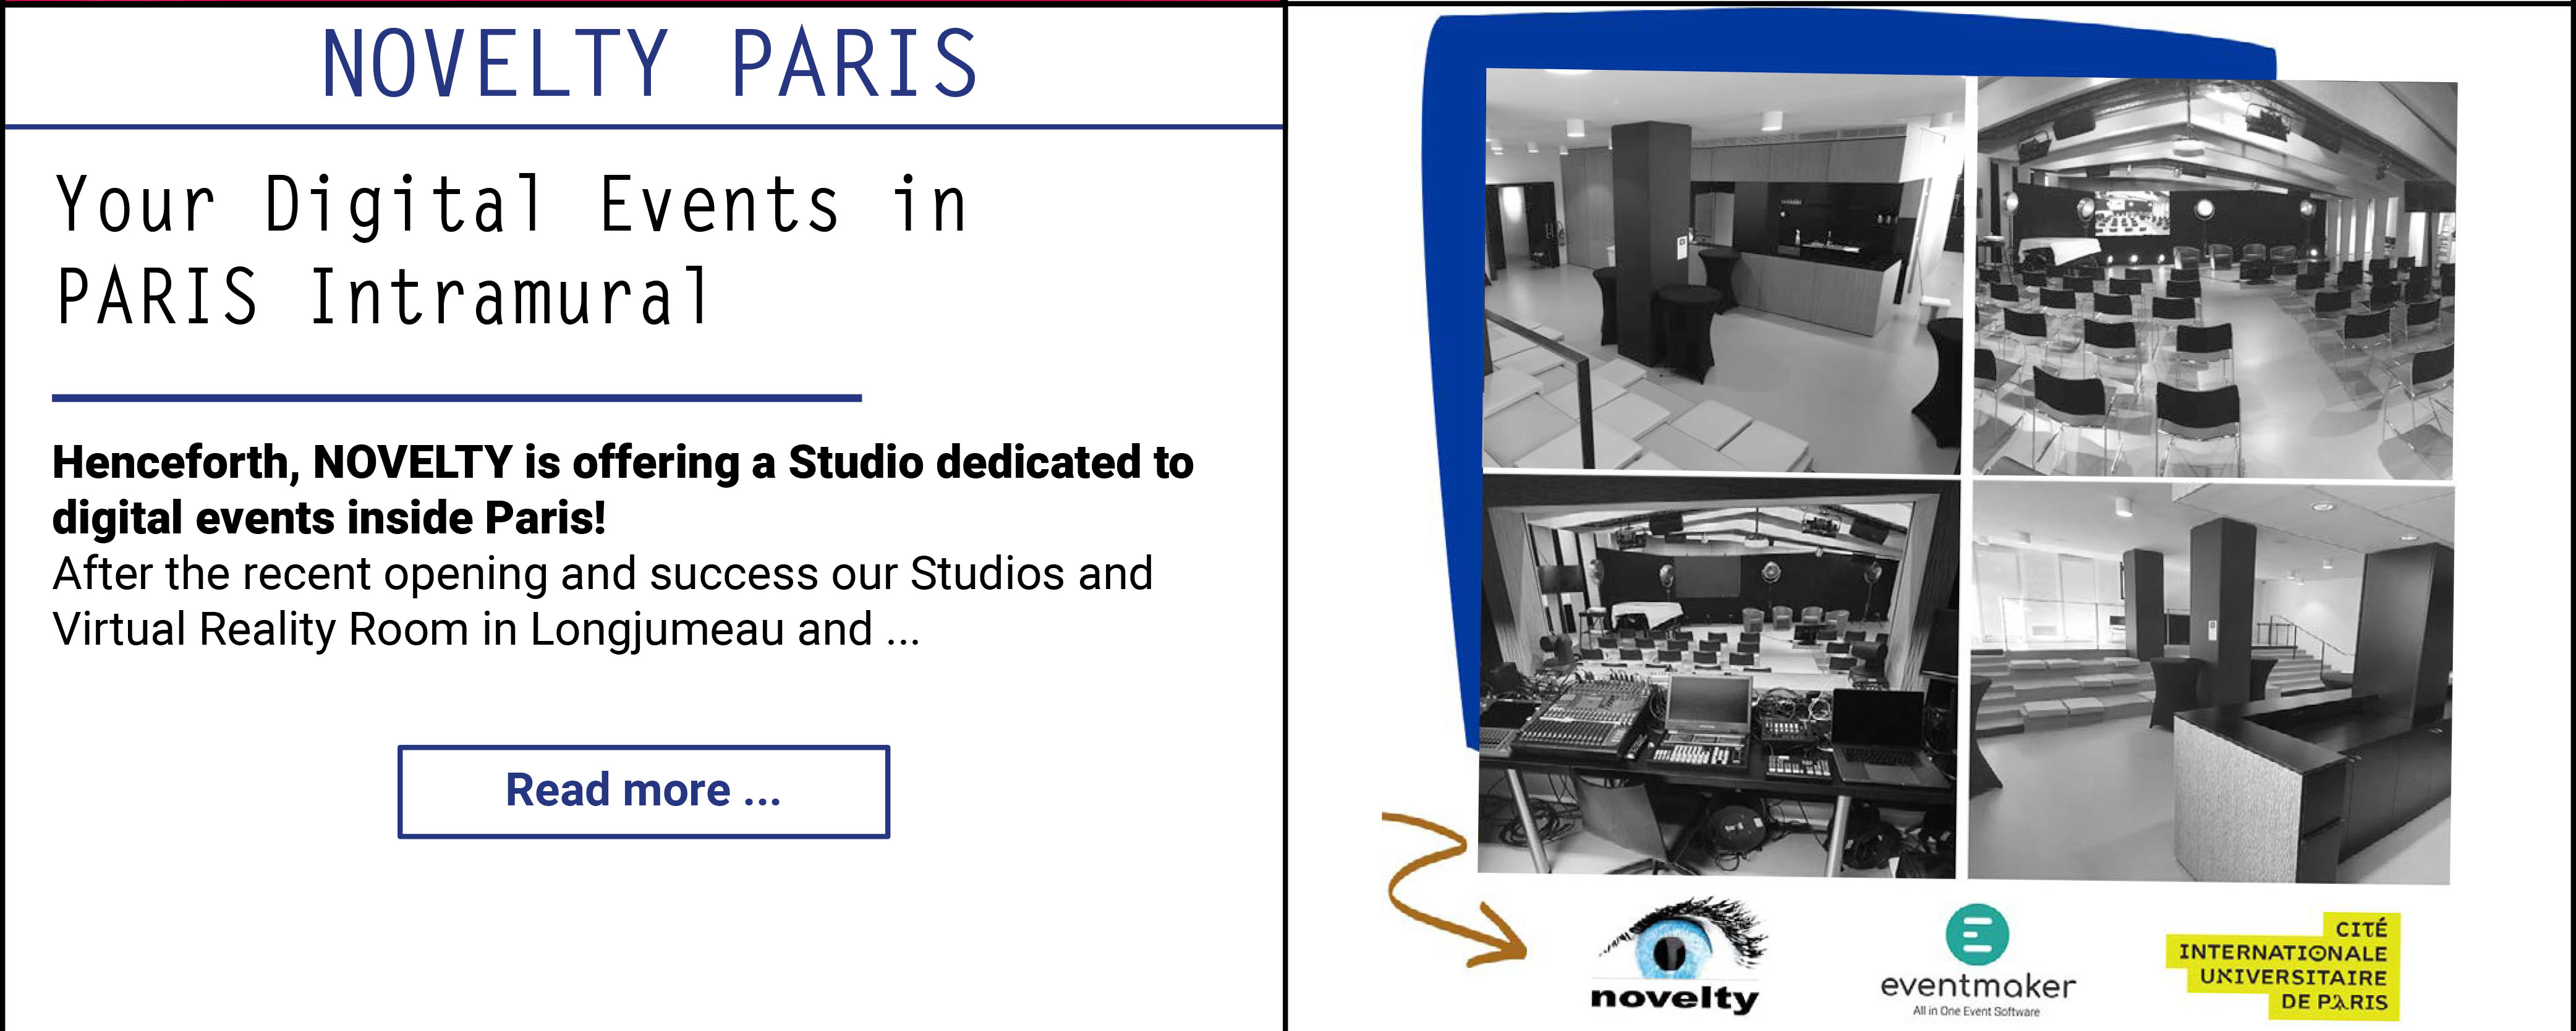 Your digital Events in Paris intramural